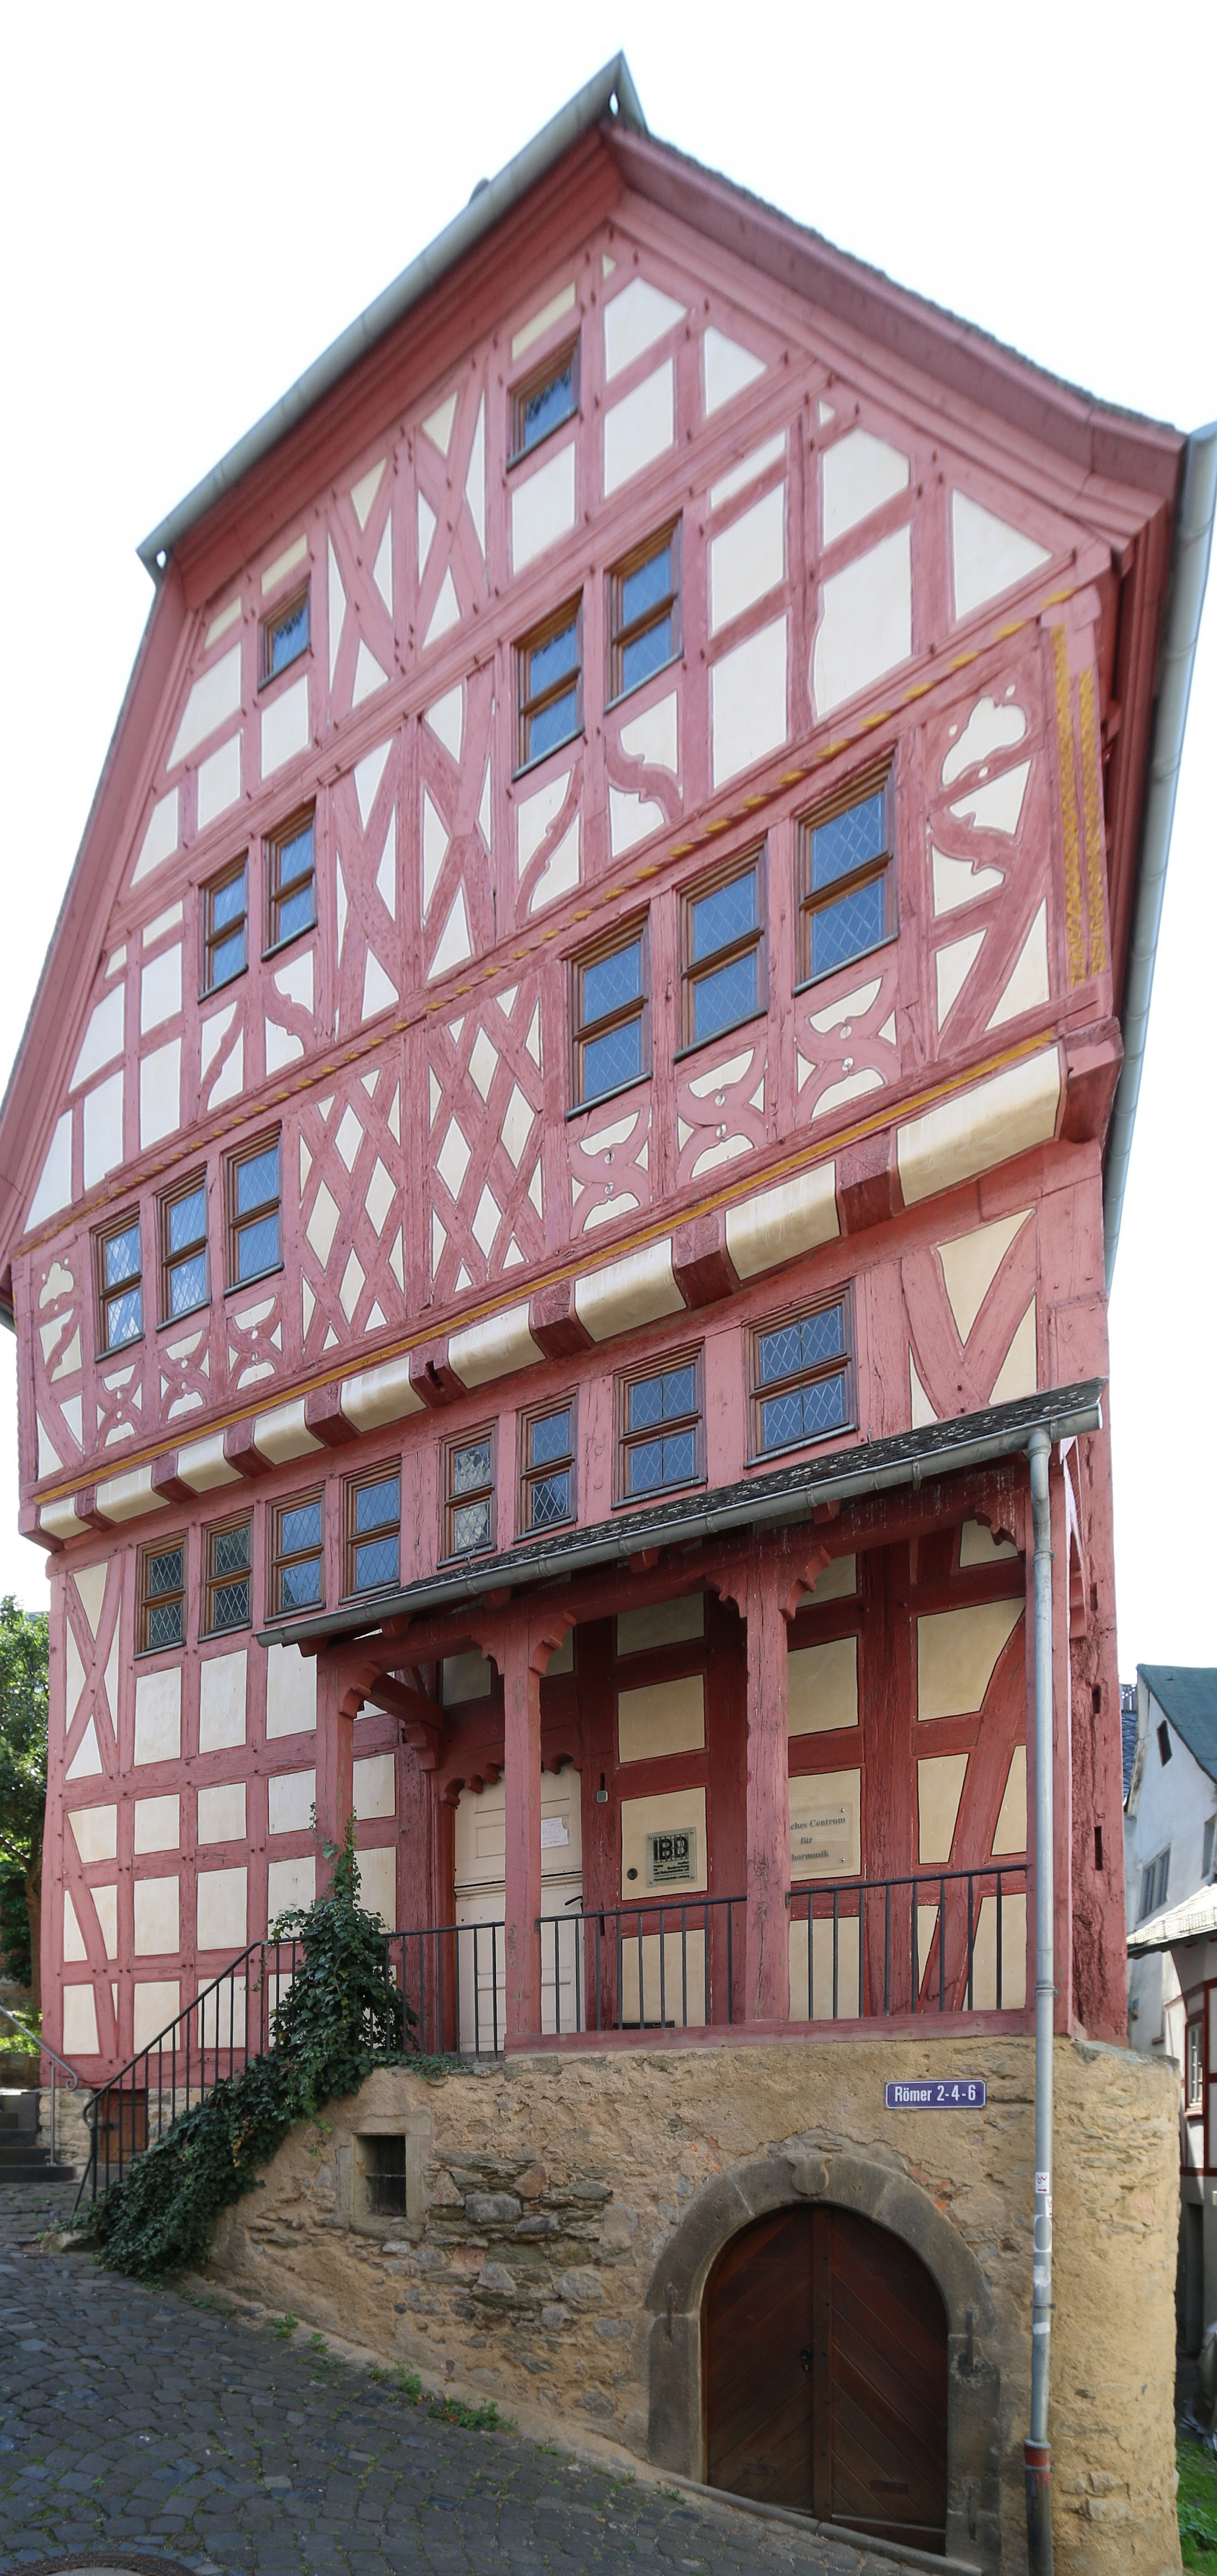 File:Limburg - Römer 2-4-6 (KD.HE 53238 1